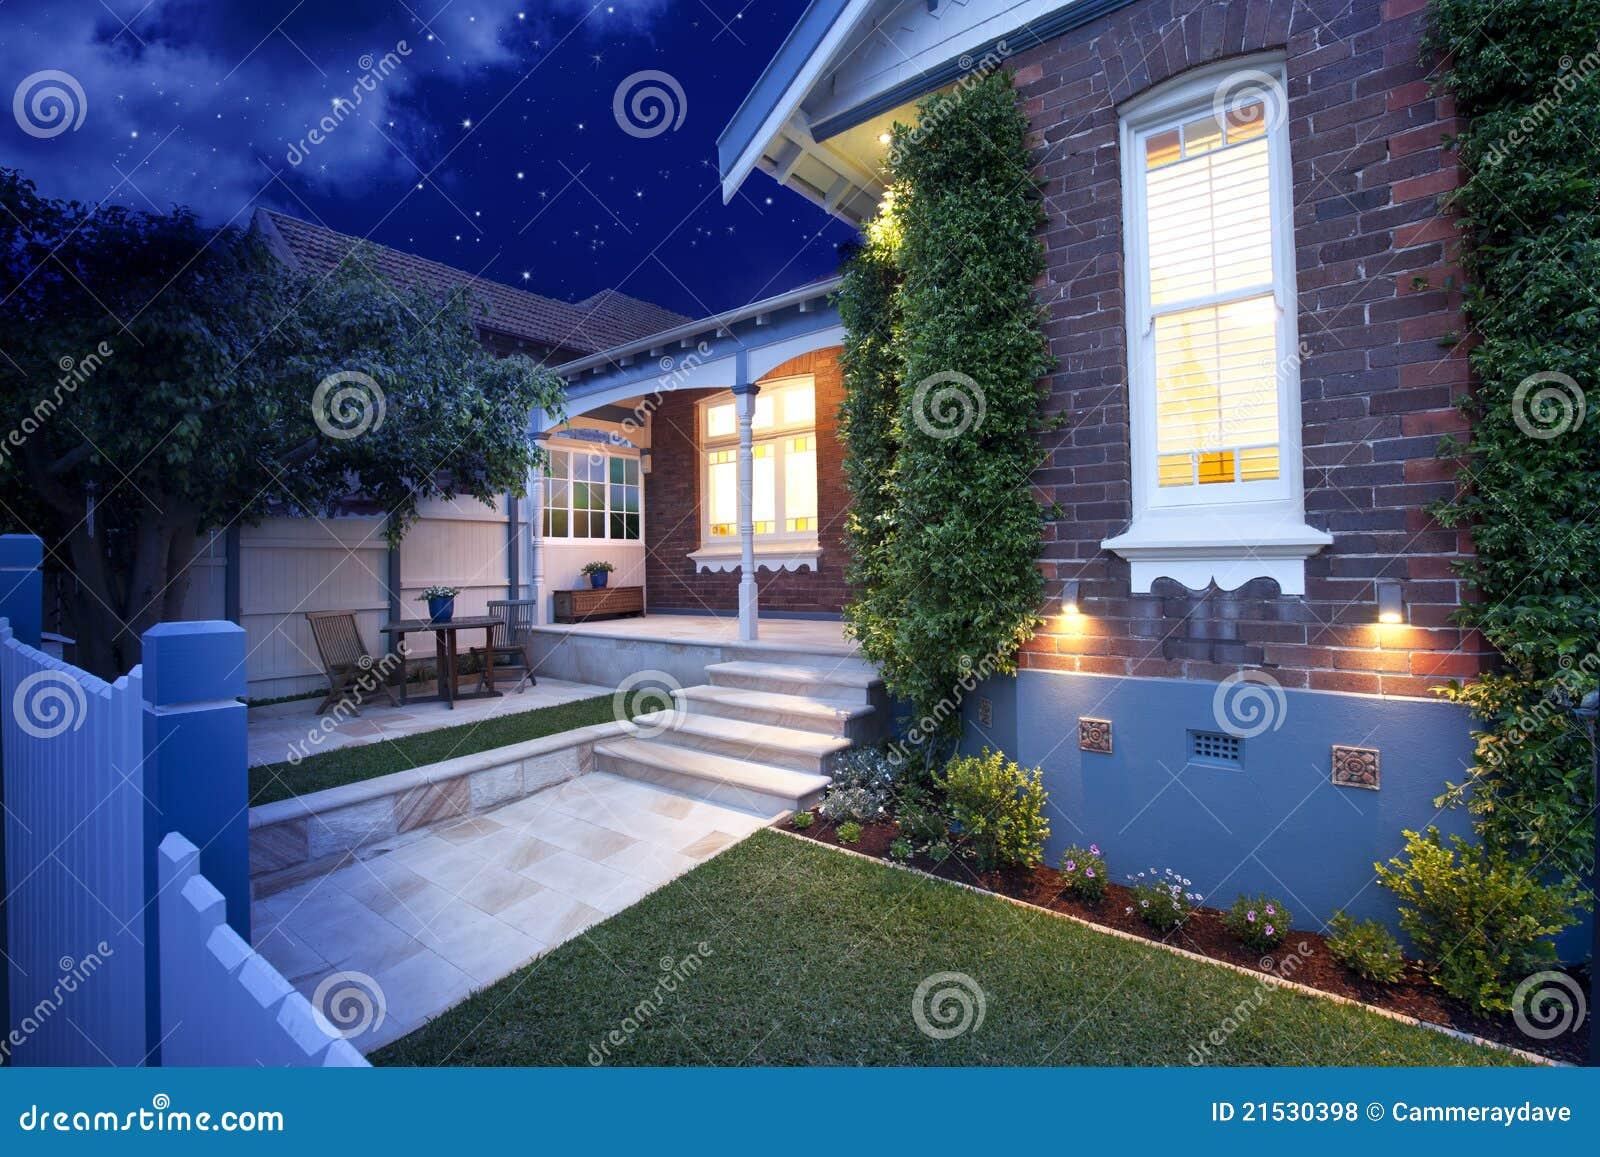 House Home Night Lights Lighting